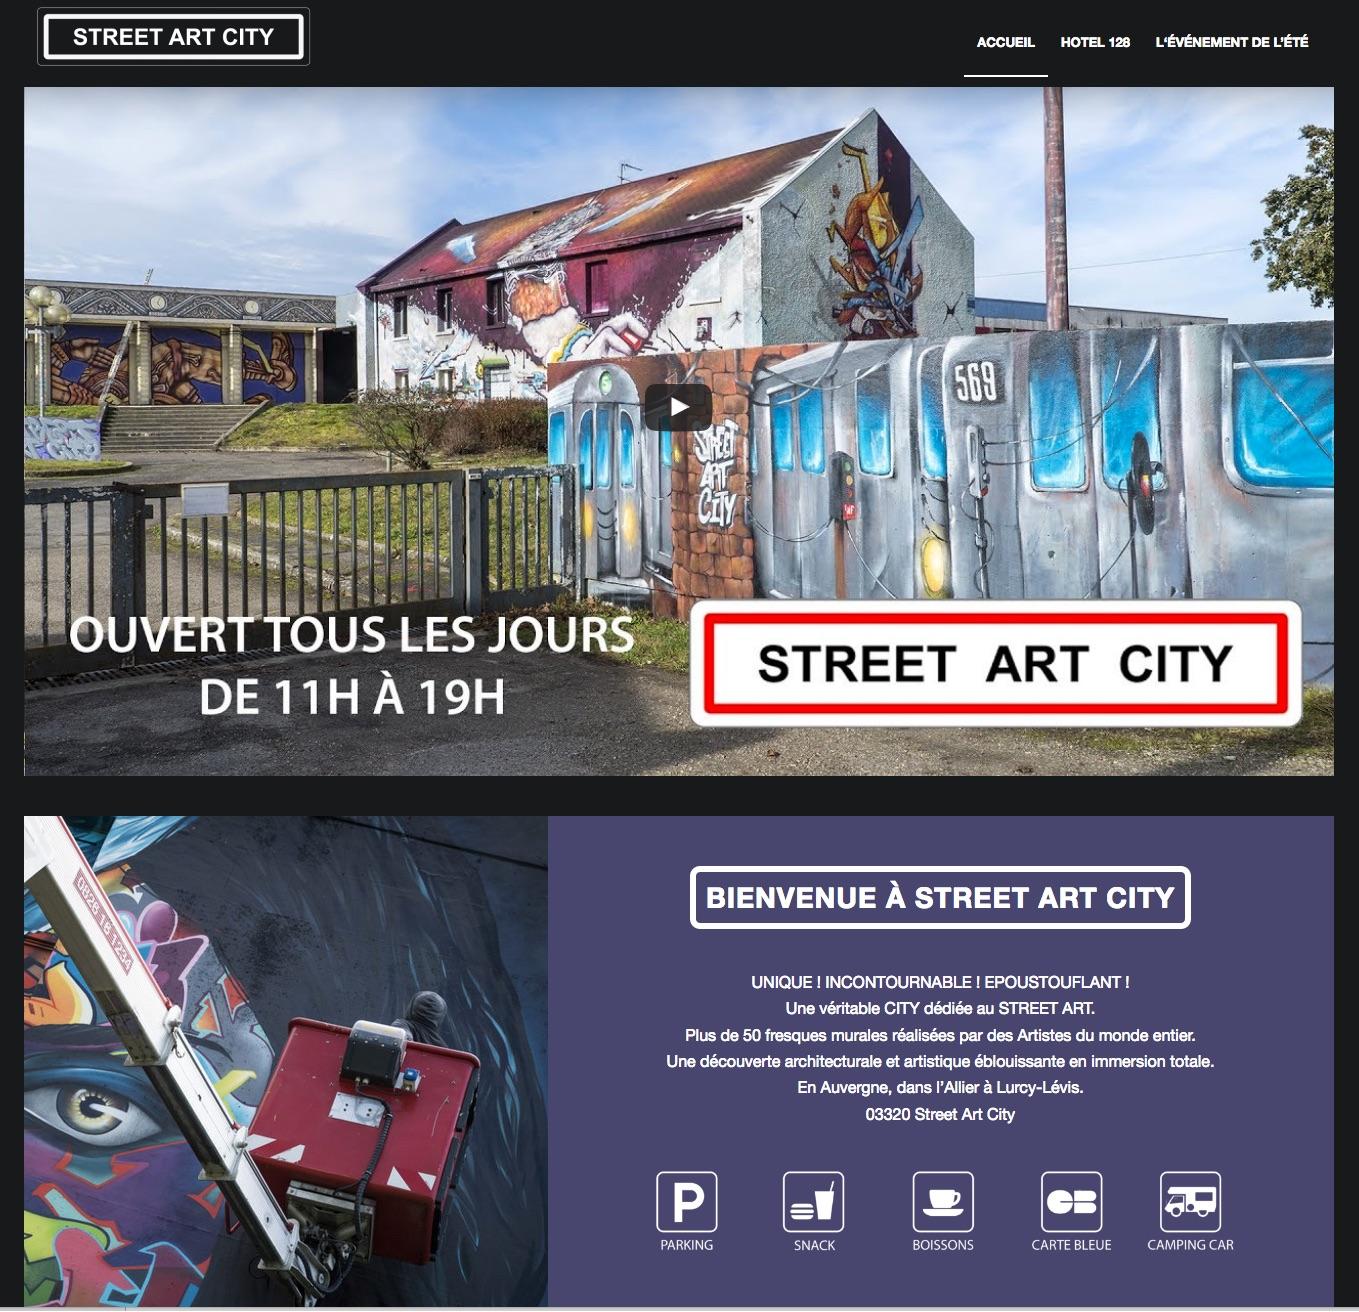 streetartcity homepage